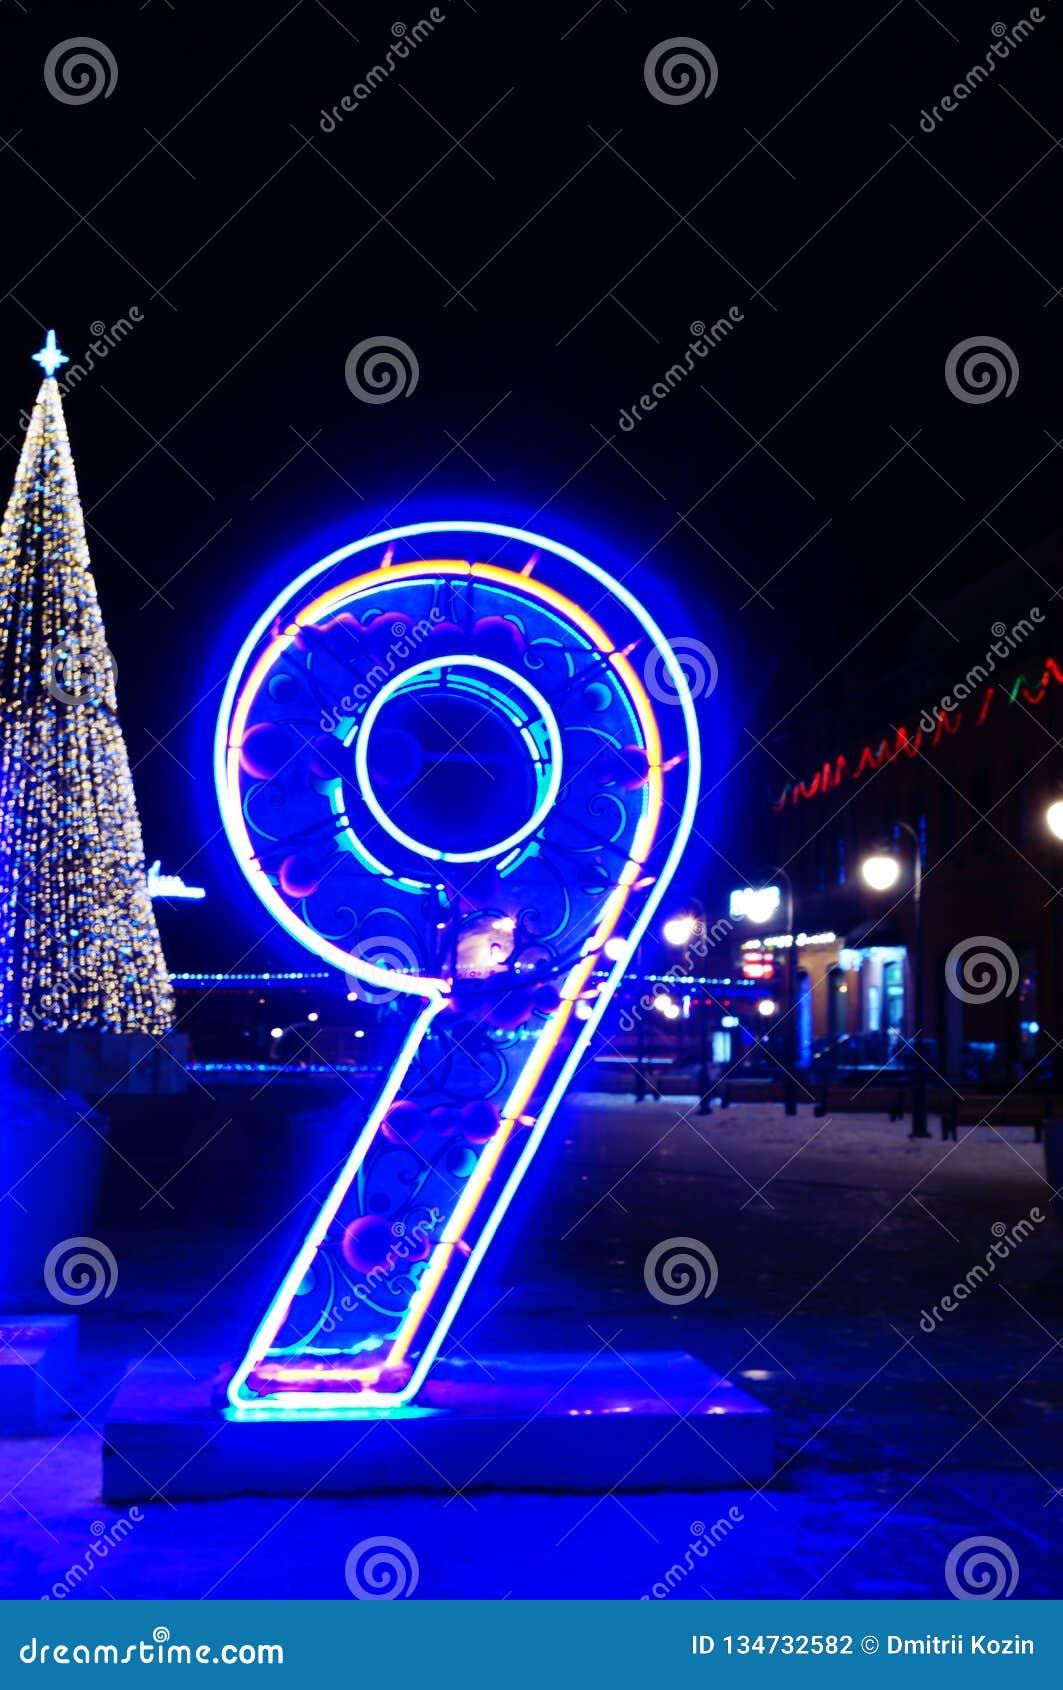 Neonlichter zwei tausend der Nr. neun neunzehn